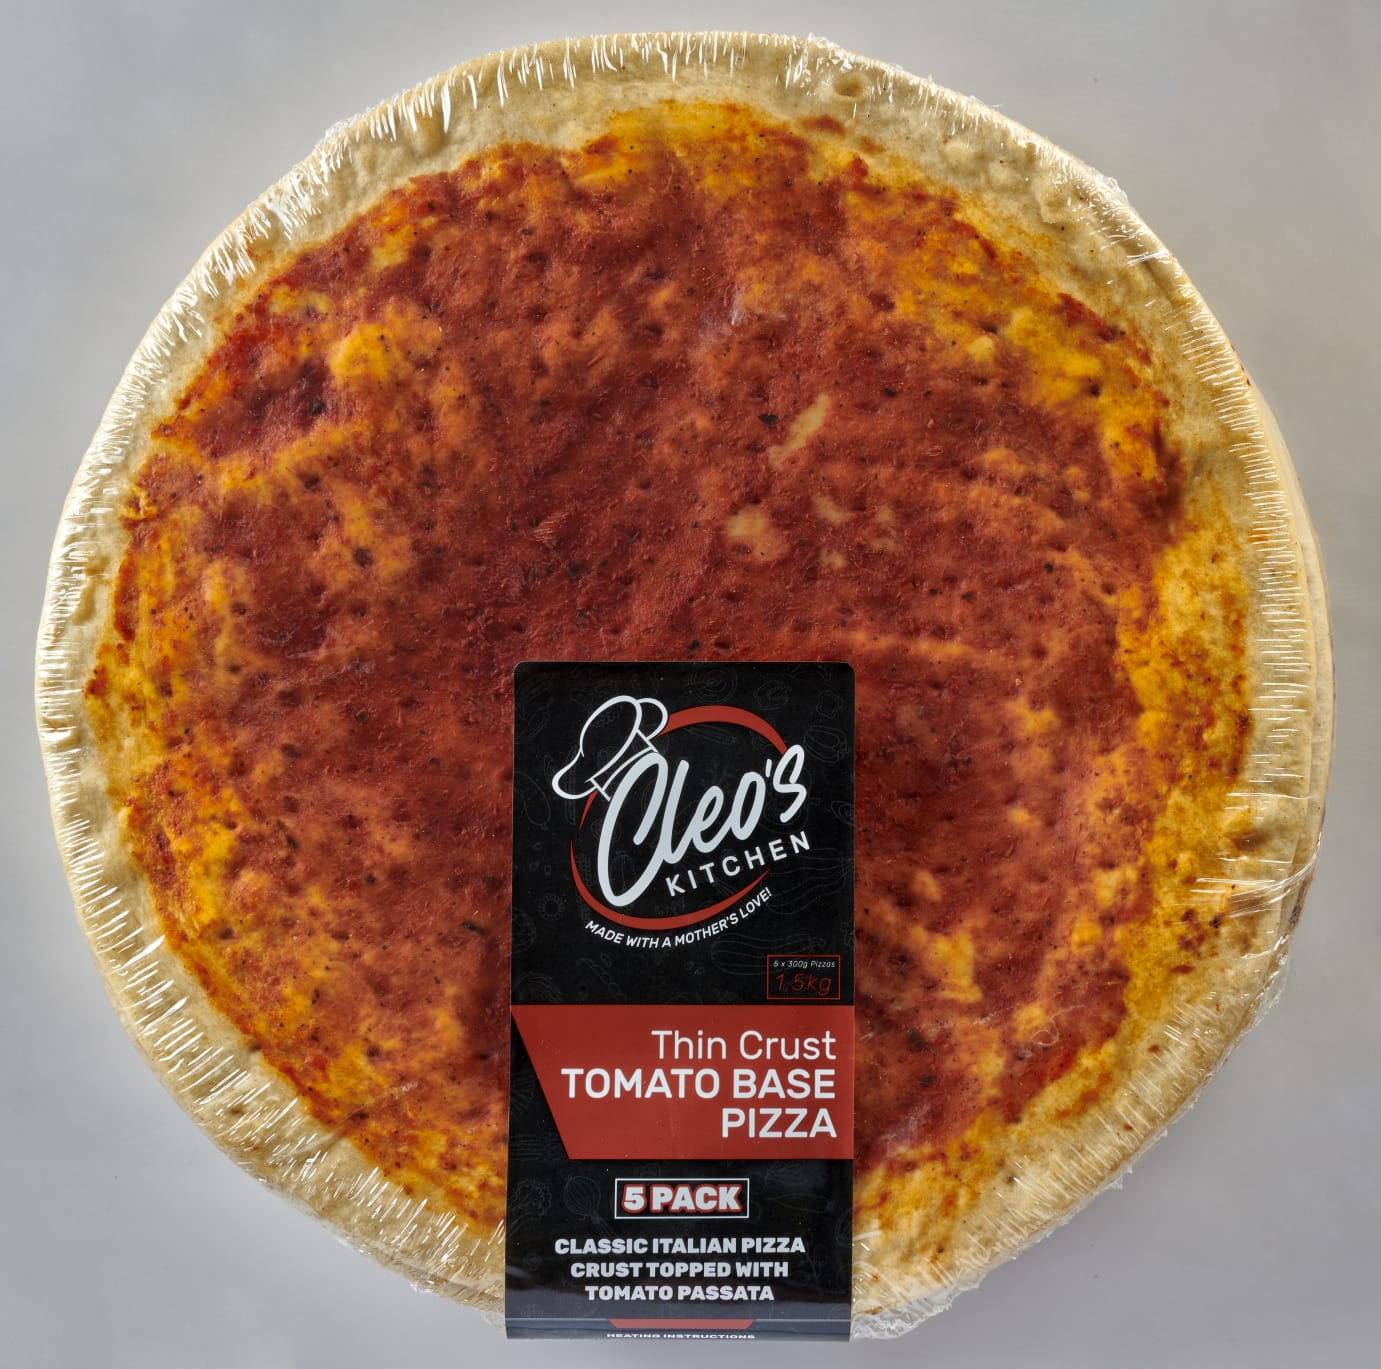 CLEO'S THIN CRUST TOMATO BASE – 1.5KG